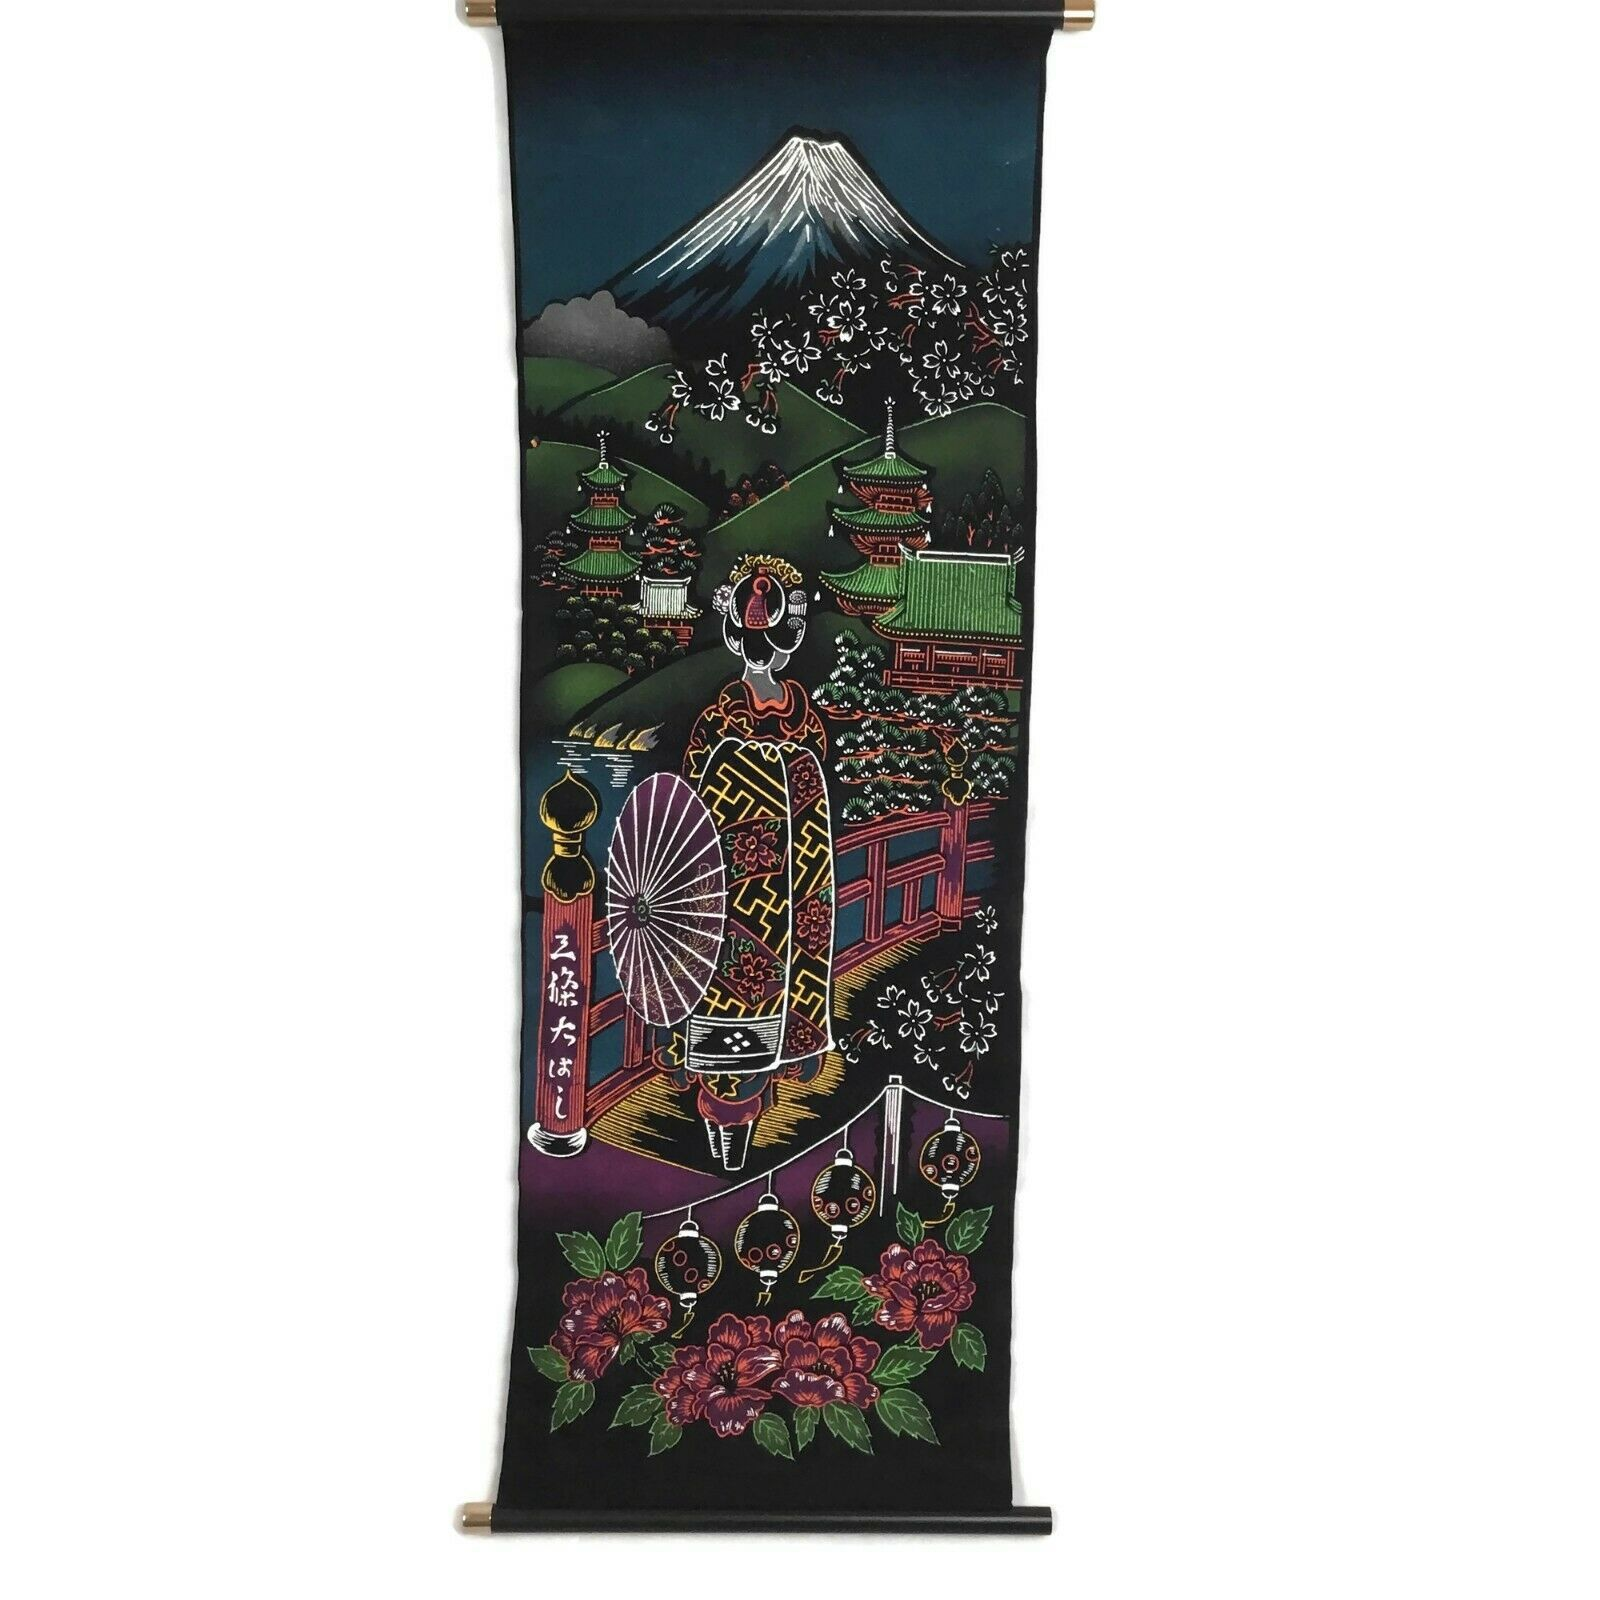 Japanese Tapestry Wall Hanging Mt Fuji Scene Geisha Painted on Felt Metallic